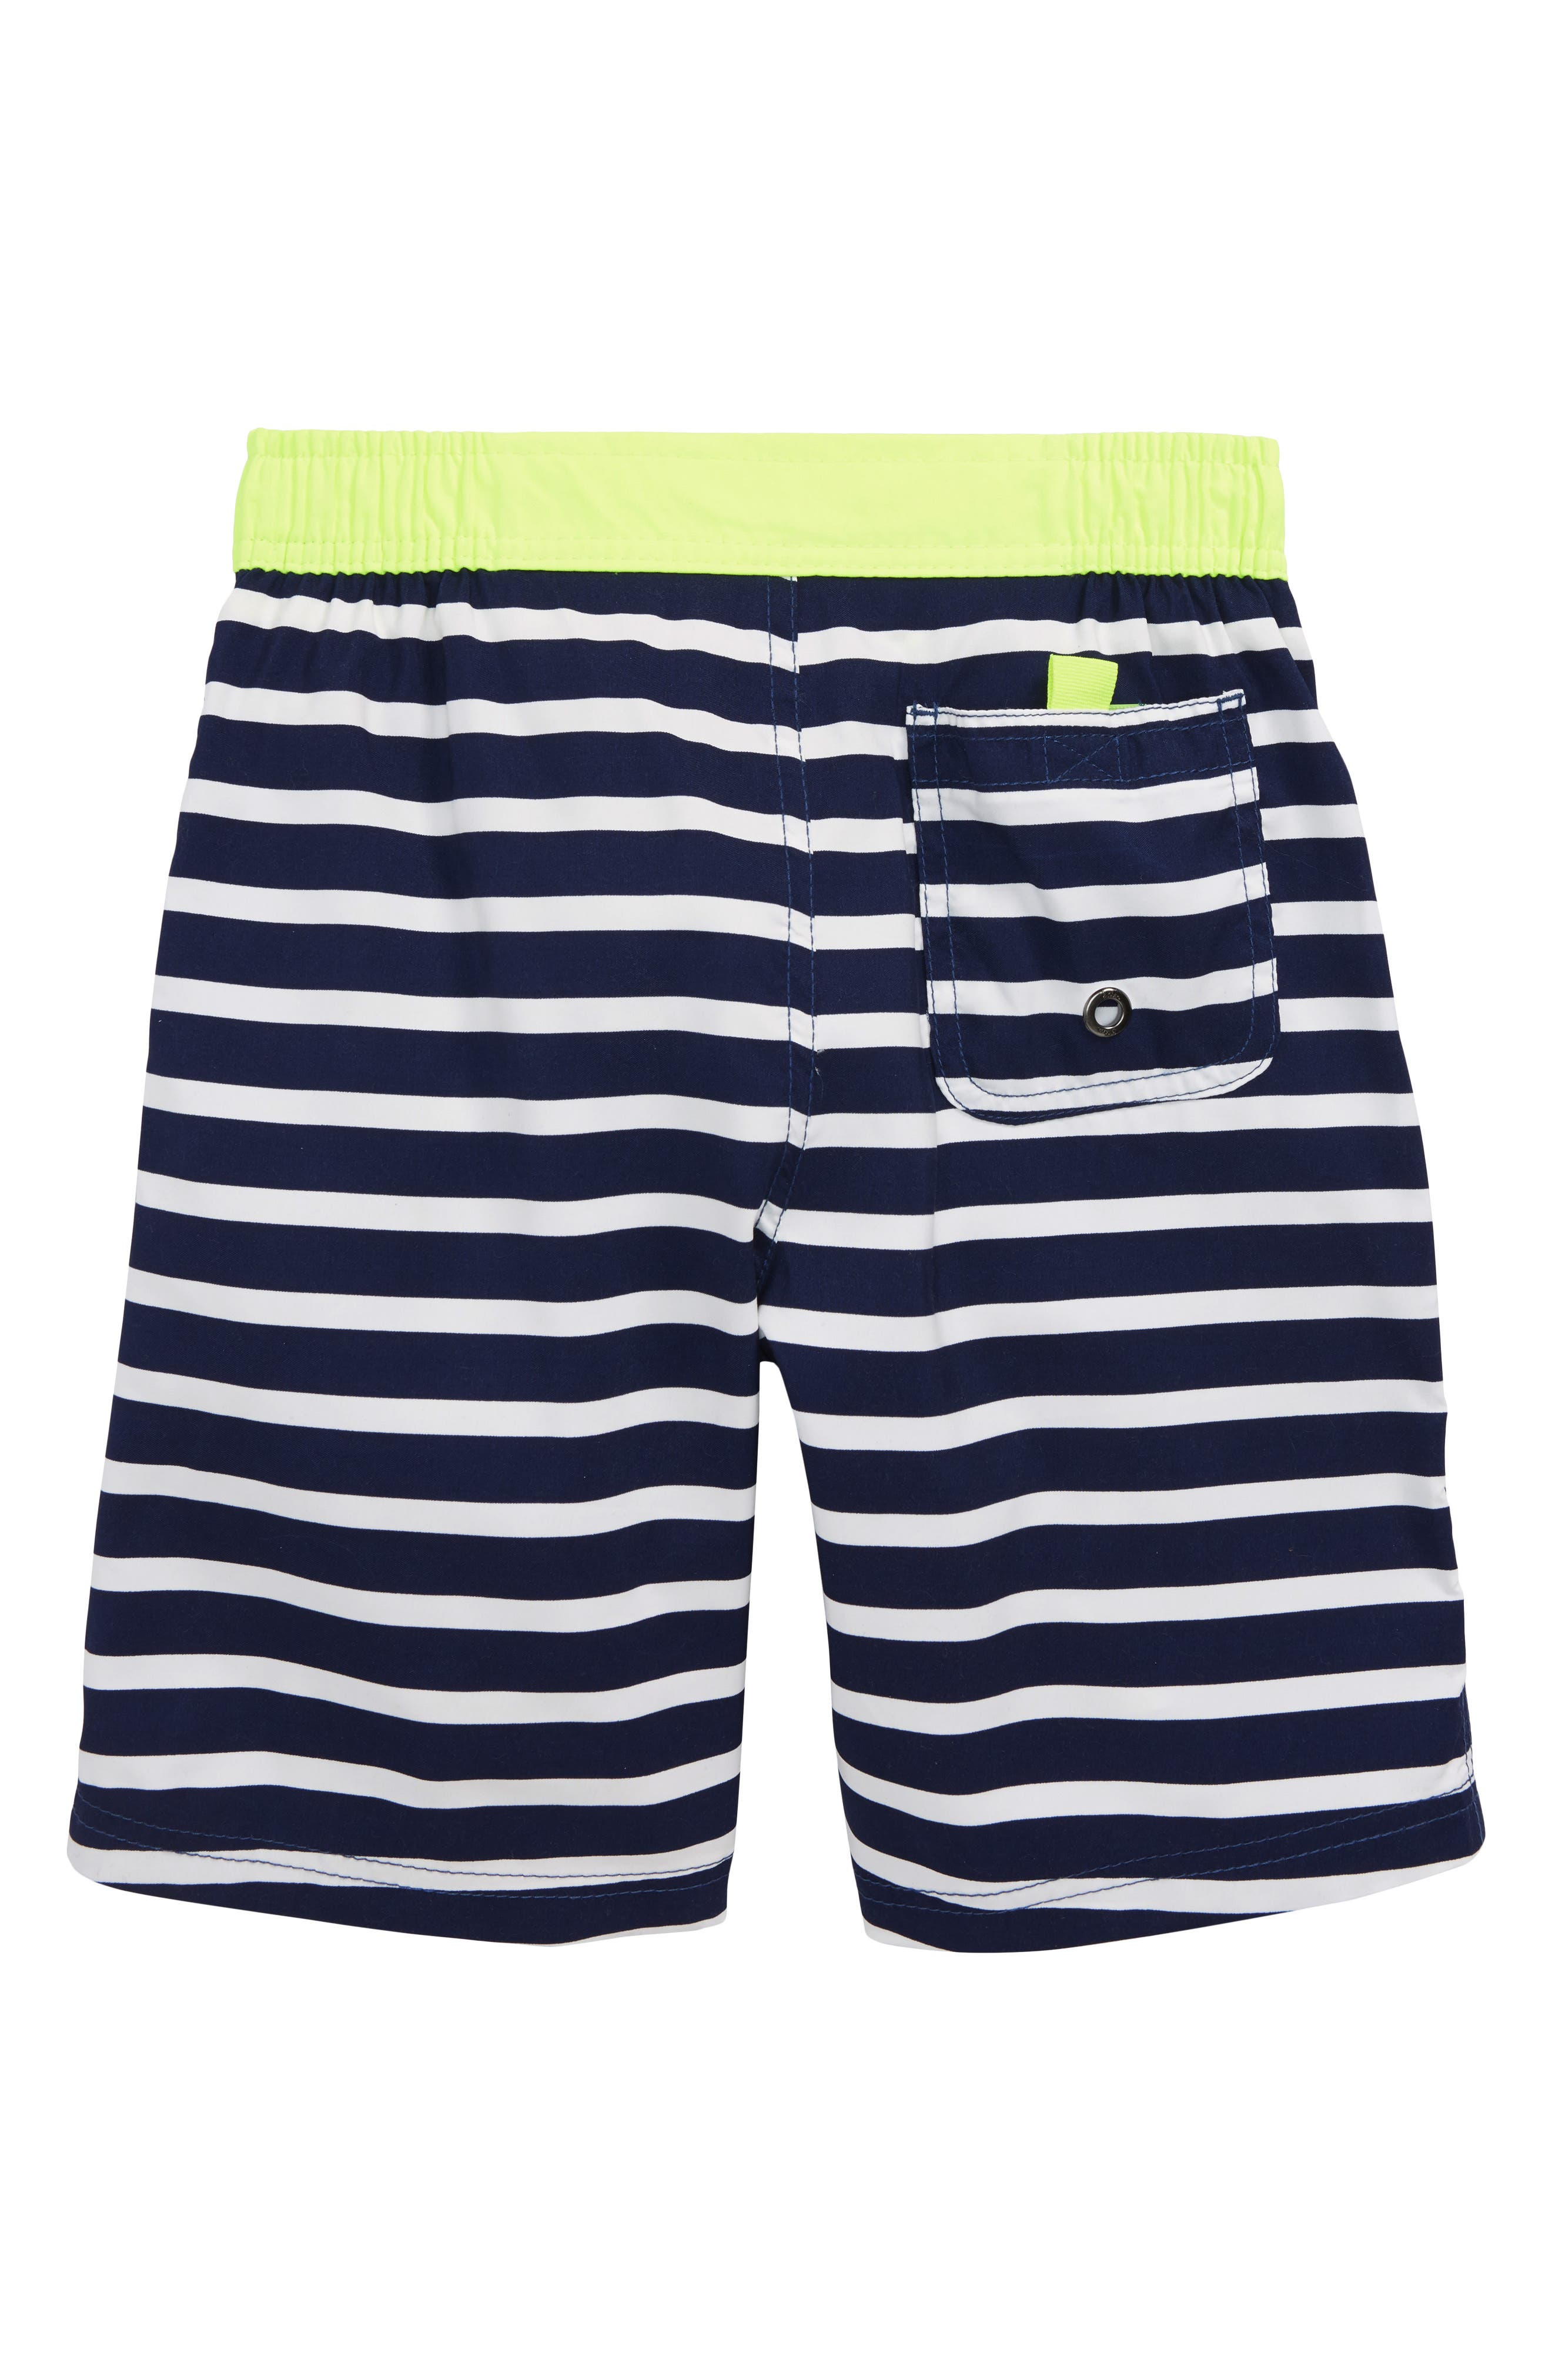 Stripe Board Shorts,                             Alternate thumbnail 2, color,                             Beacon Blue/ Ecru